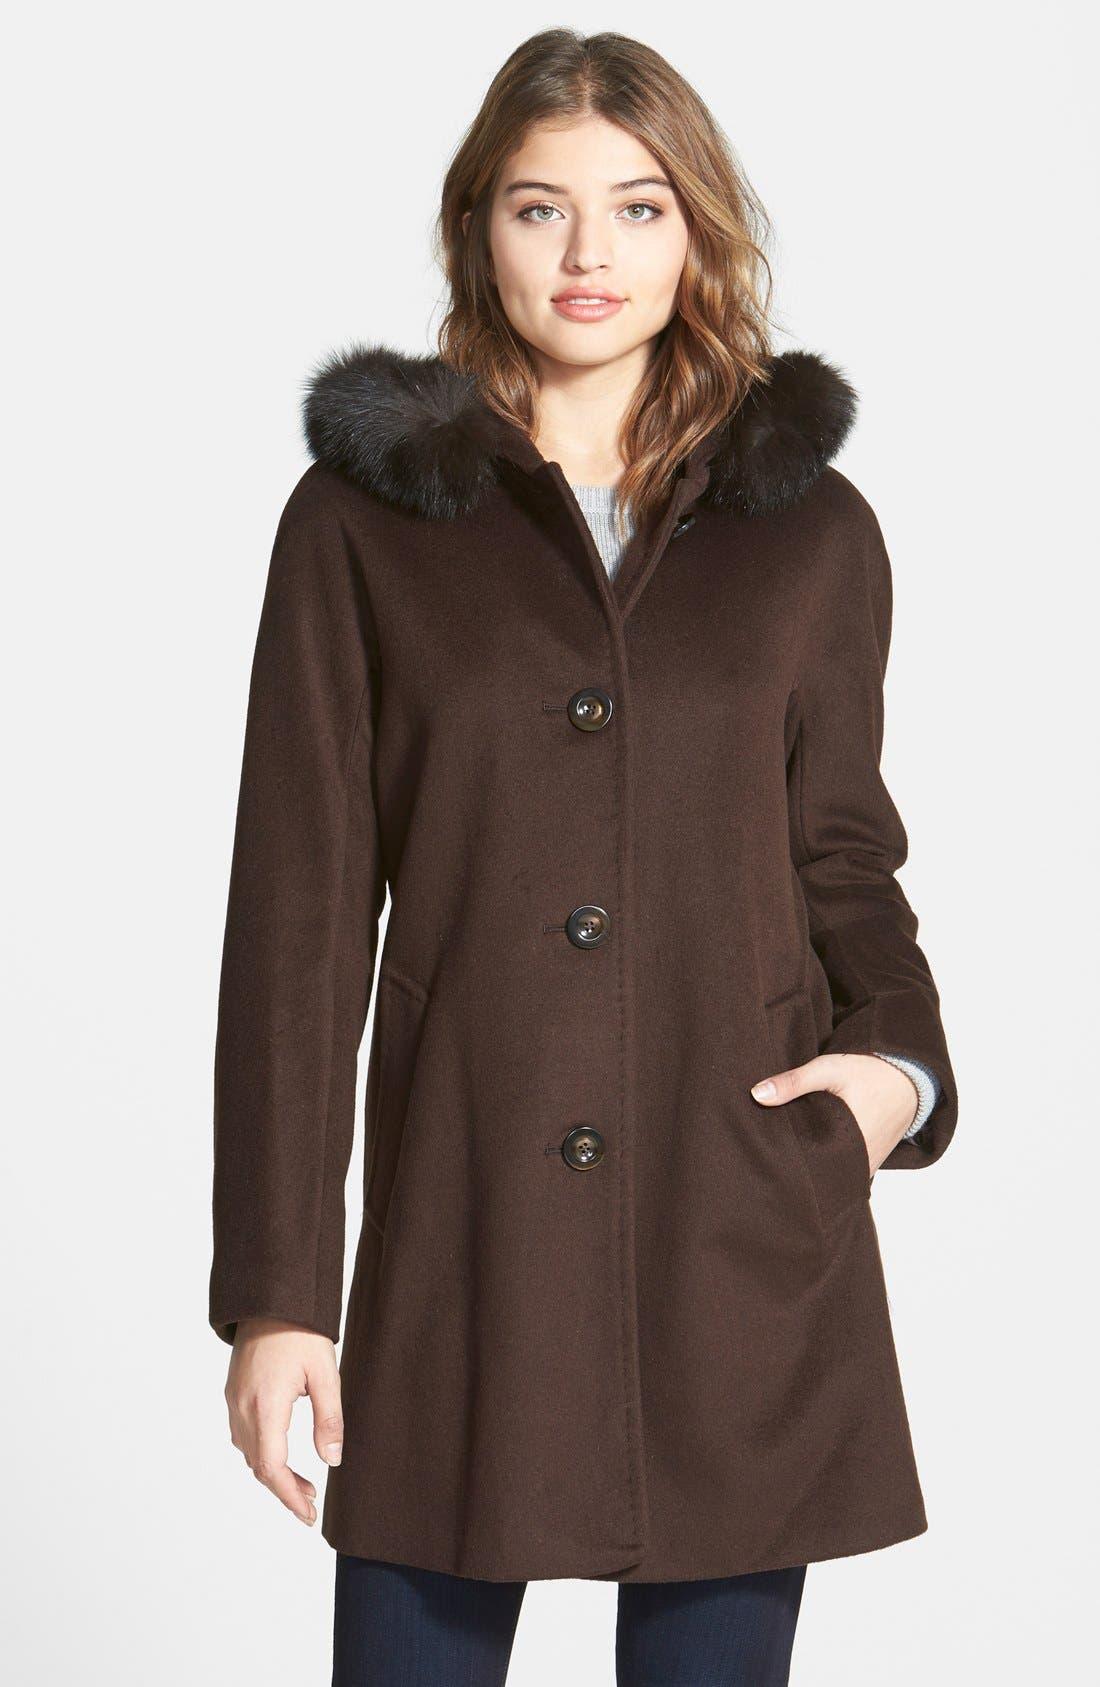 Main Image - Ellen Tracy Kimono Sleeve Jacket with Genuine Fox Fur Trim (Online Only)